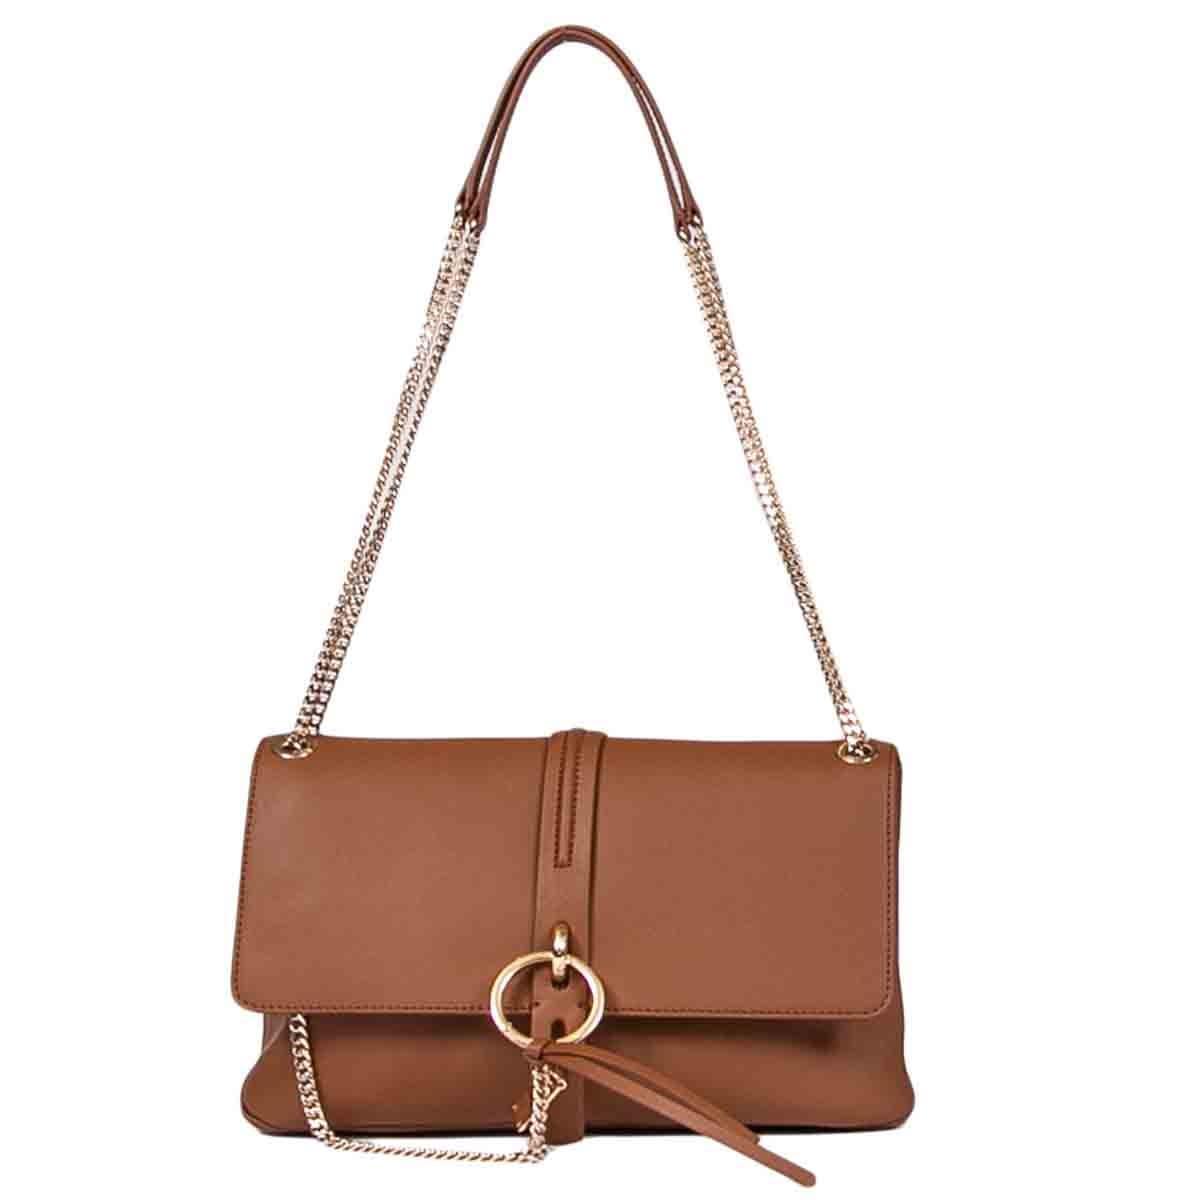 Medium Etoile Cross Body Bag